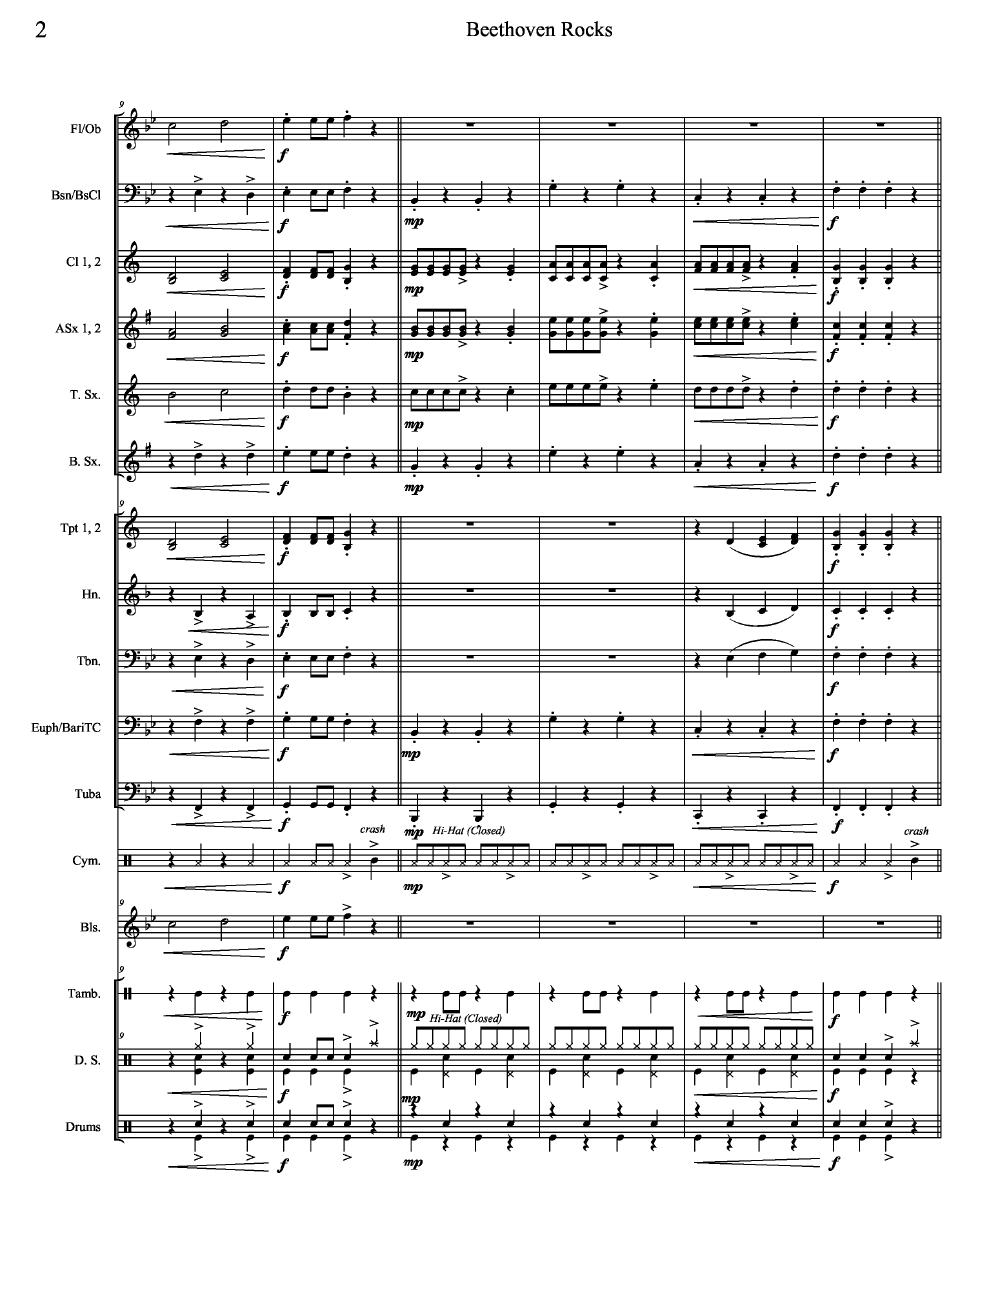 Beethoven Rocks by Ludwig van Beethoven/arr  Bob | J W